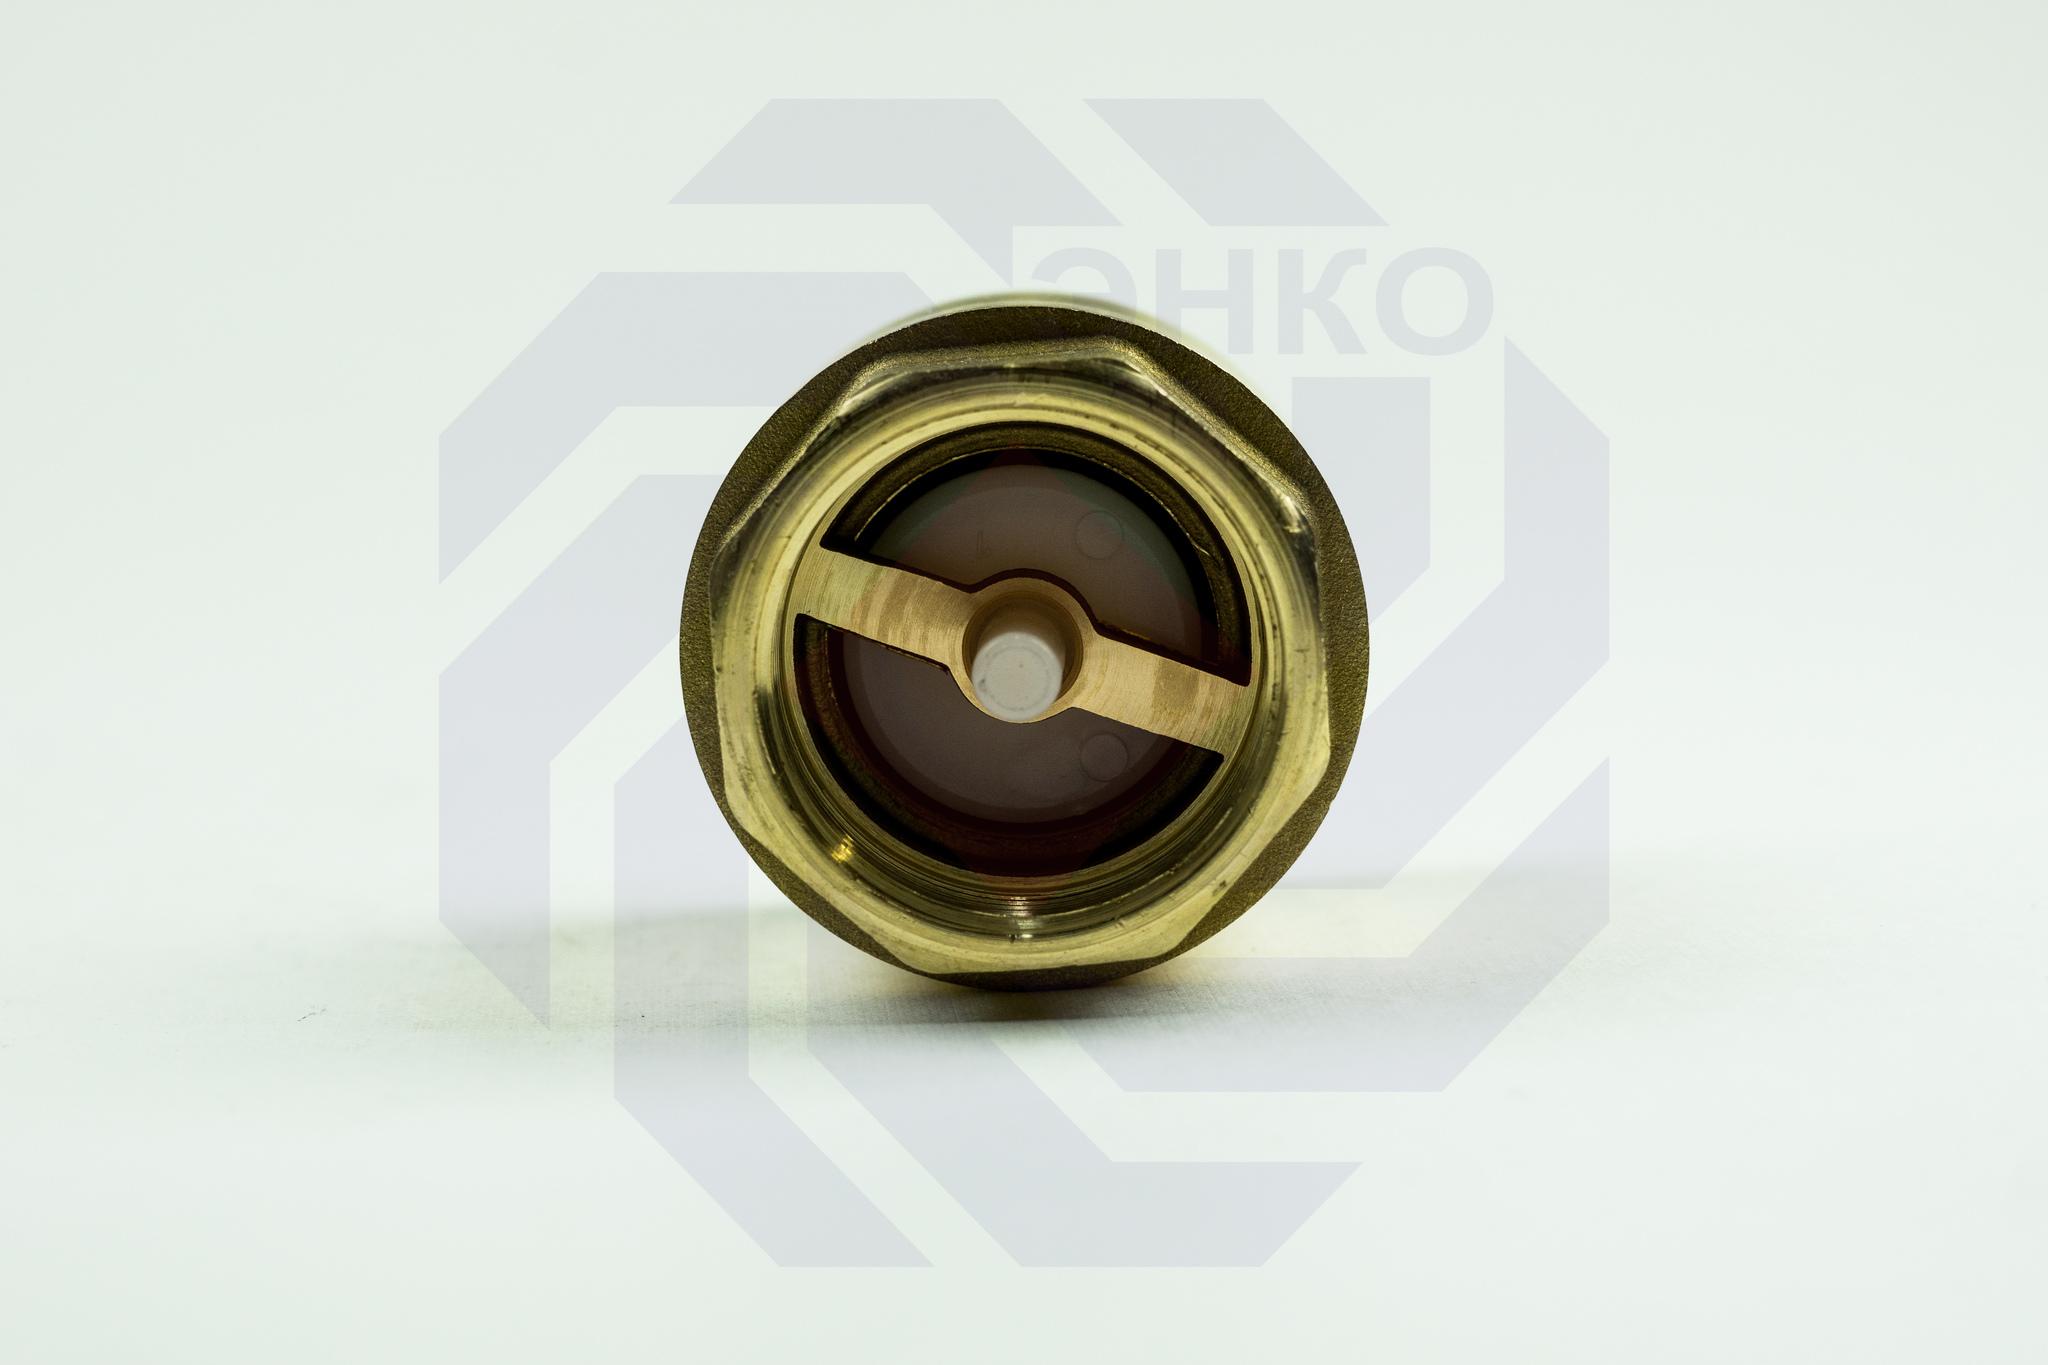 Клапан обратный ВР/ВР BUGATTI EURO 1000 1¼